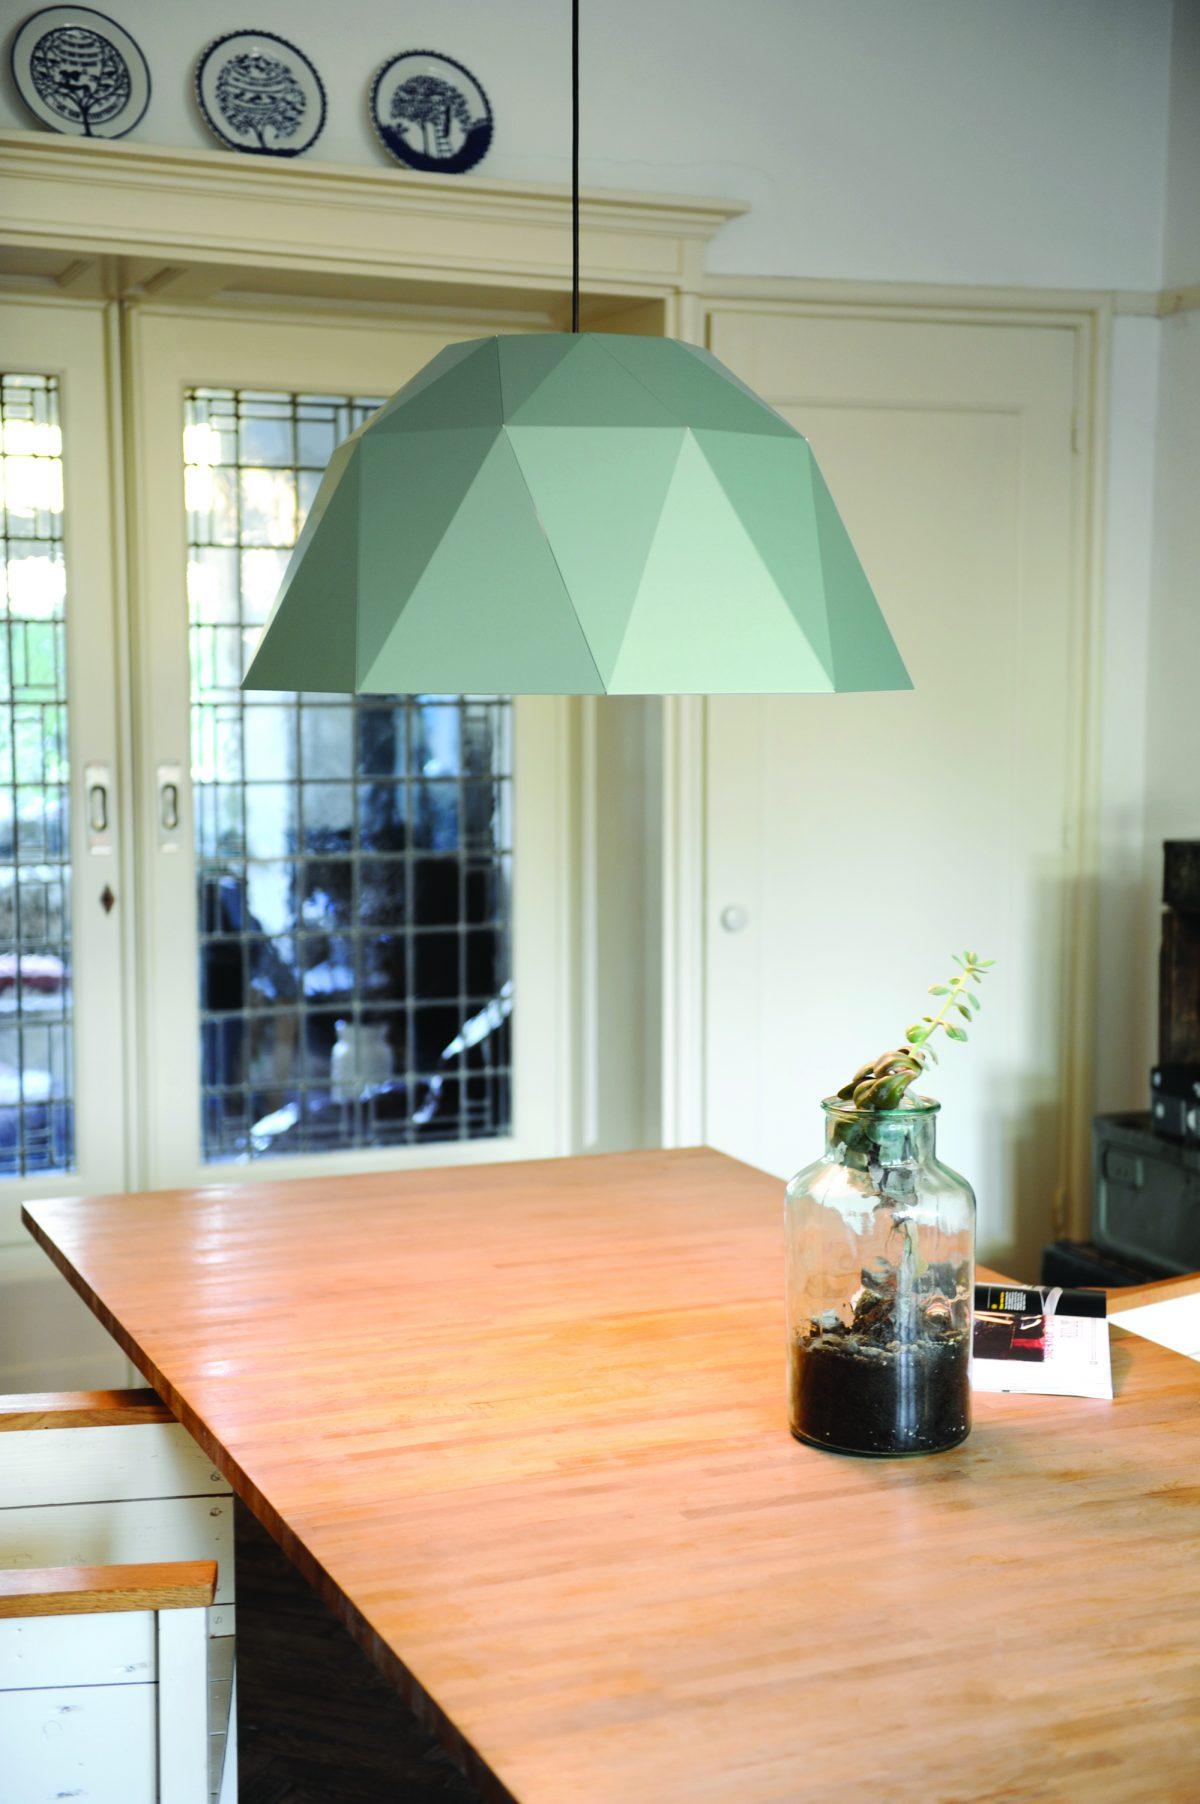 Sander Mulder Carat hanglamp Jade groen – Gimmii